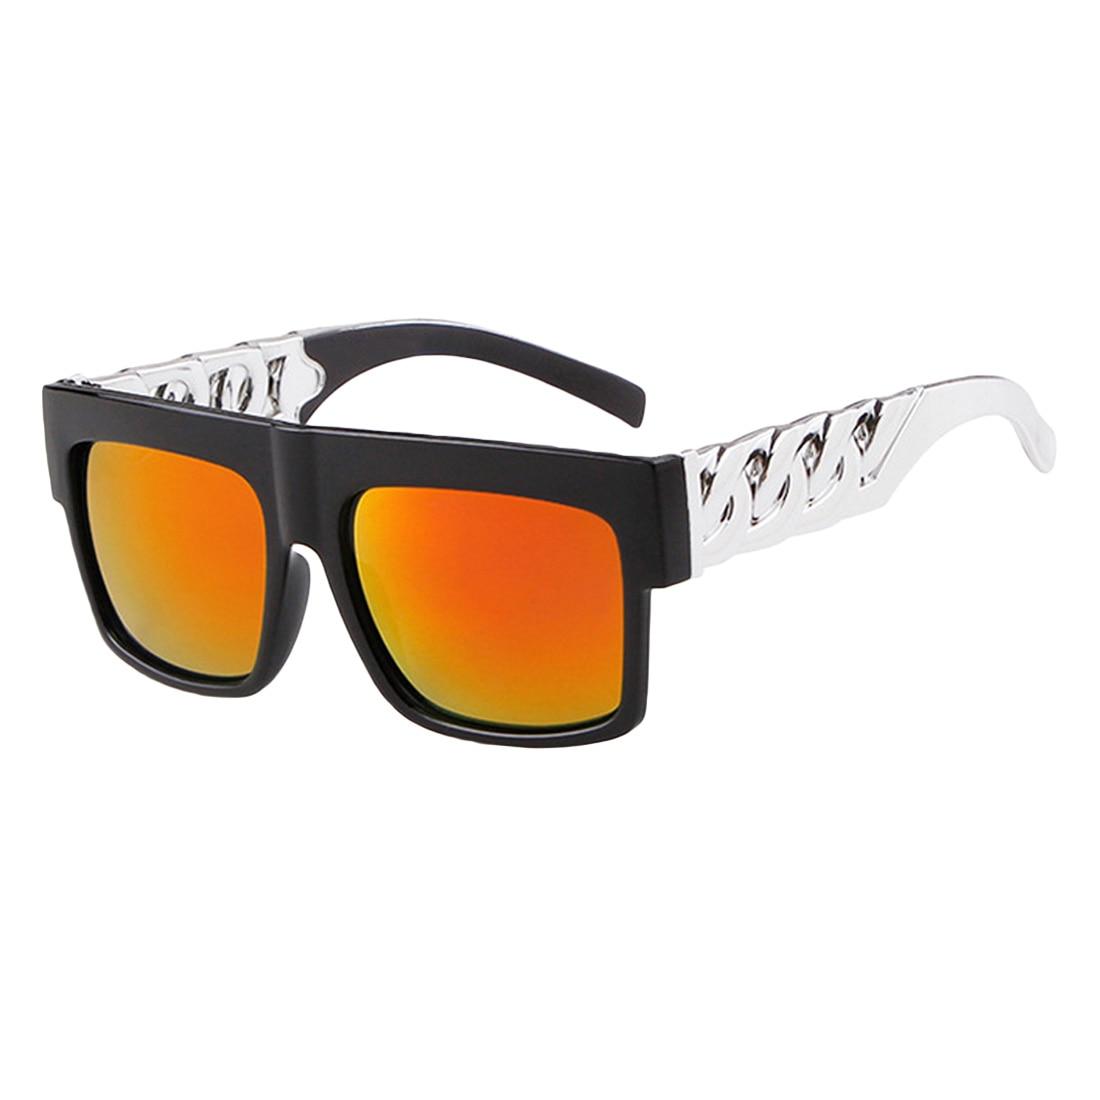 Vintage Gold Metal Chain Sunglasses Fashion Hip Hop Sun Glasses Oculos De Sol women sunglasses lunette soleil femme in Women 39 s Sunglasses from Apparel Accessories